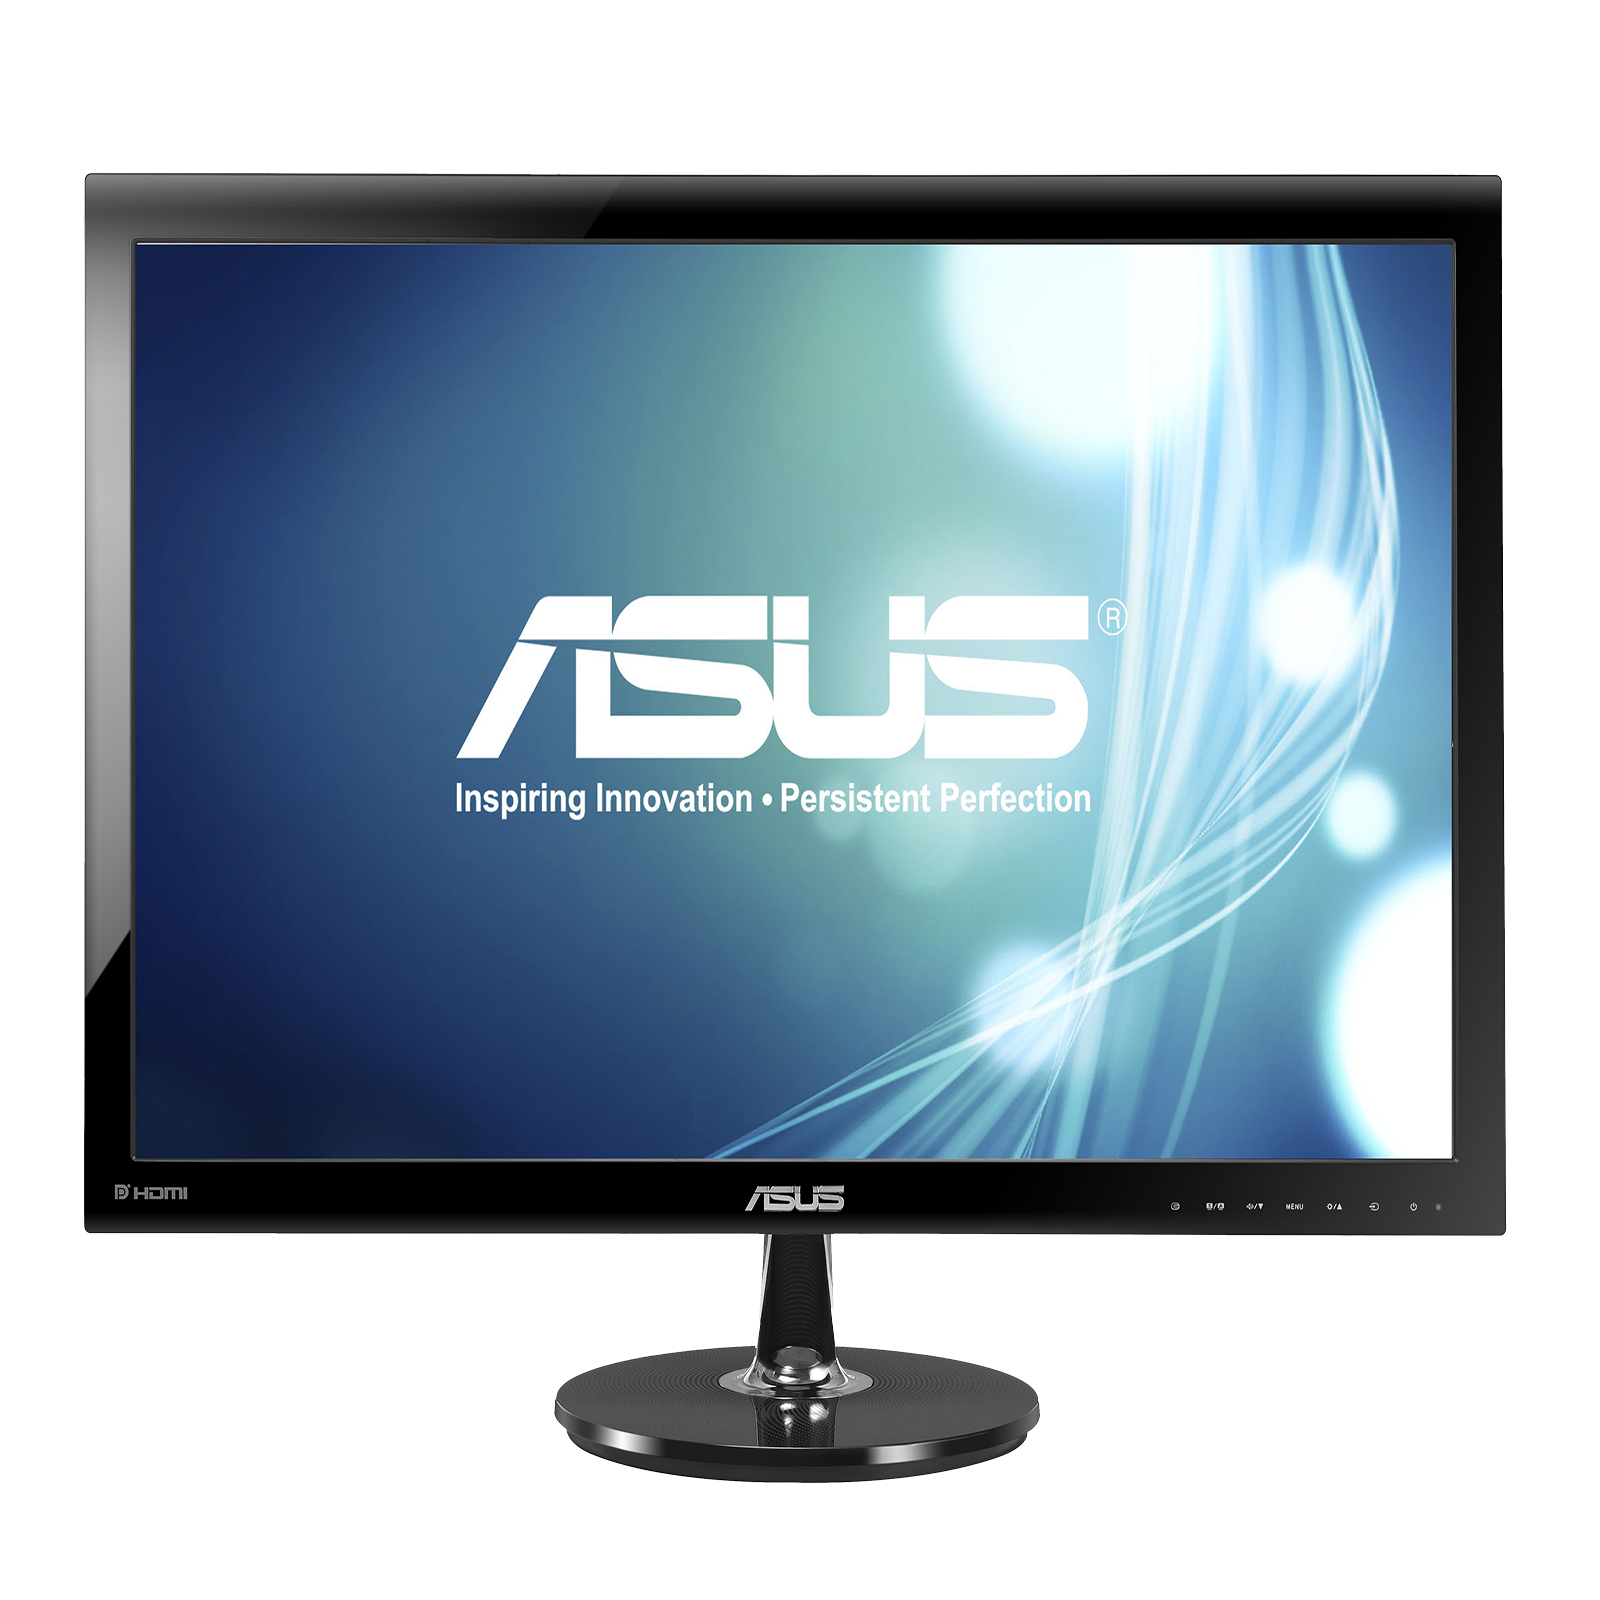 Asus | VS278Q | VS278Q | 27 inch | LED | 1920x1080 pixeli